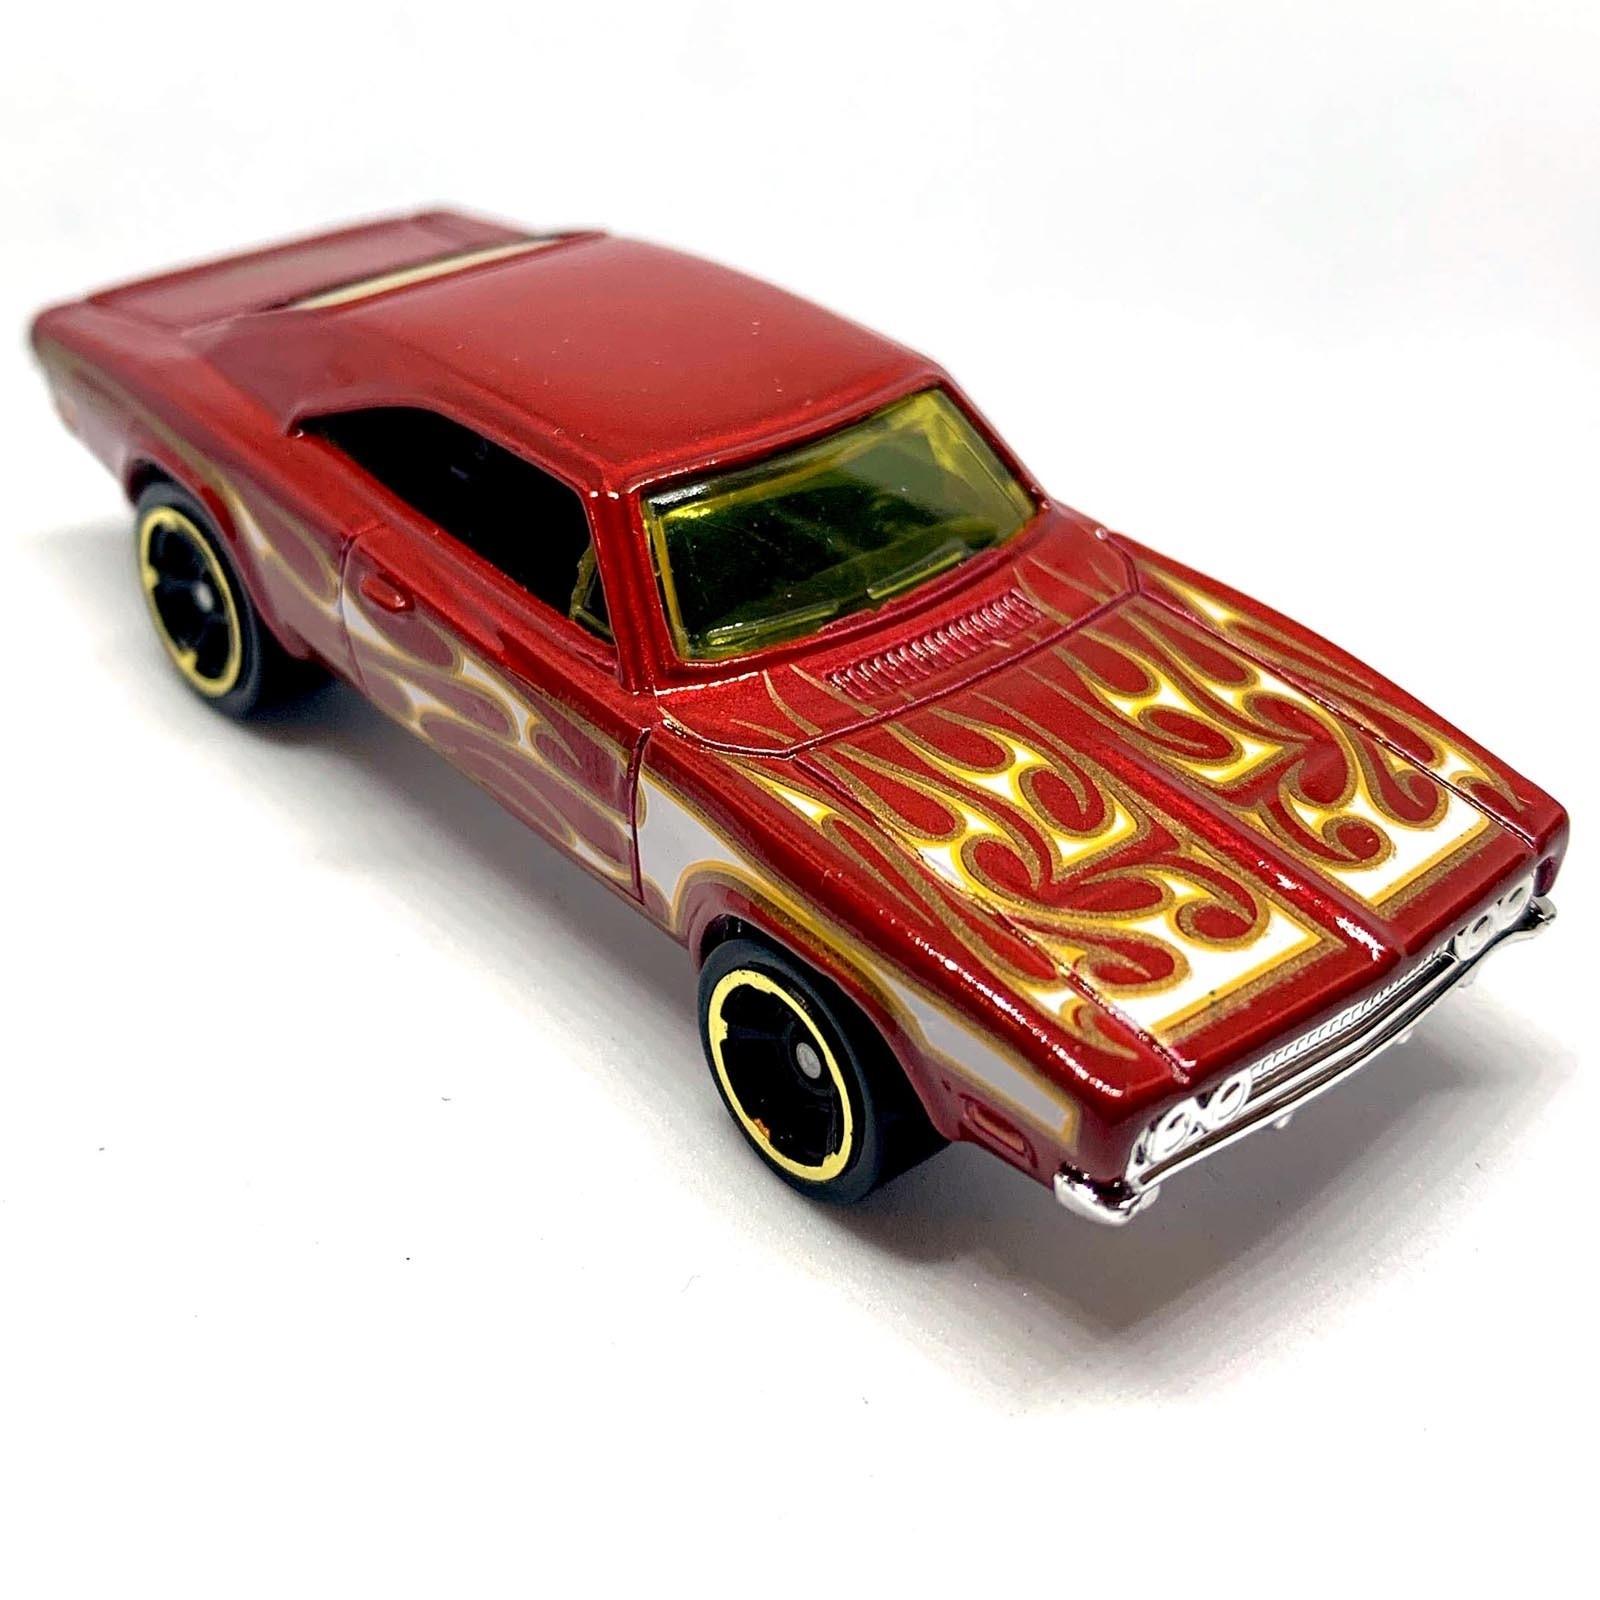 Carrinho Hot Wheels '69 Dodger Charger 500 Vermelho (QOZDP) HW Flames - Mattel